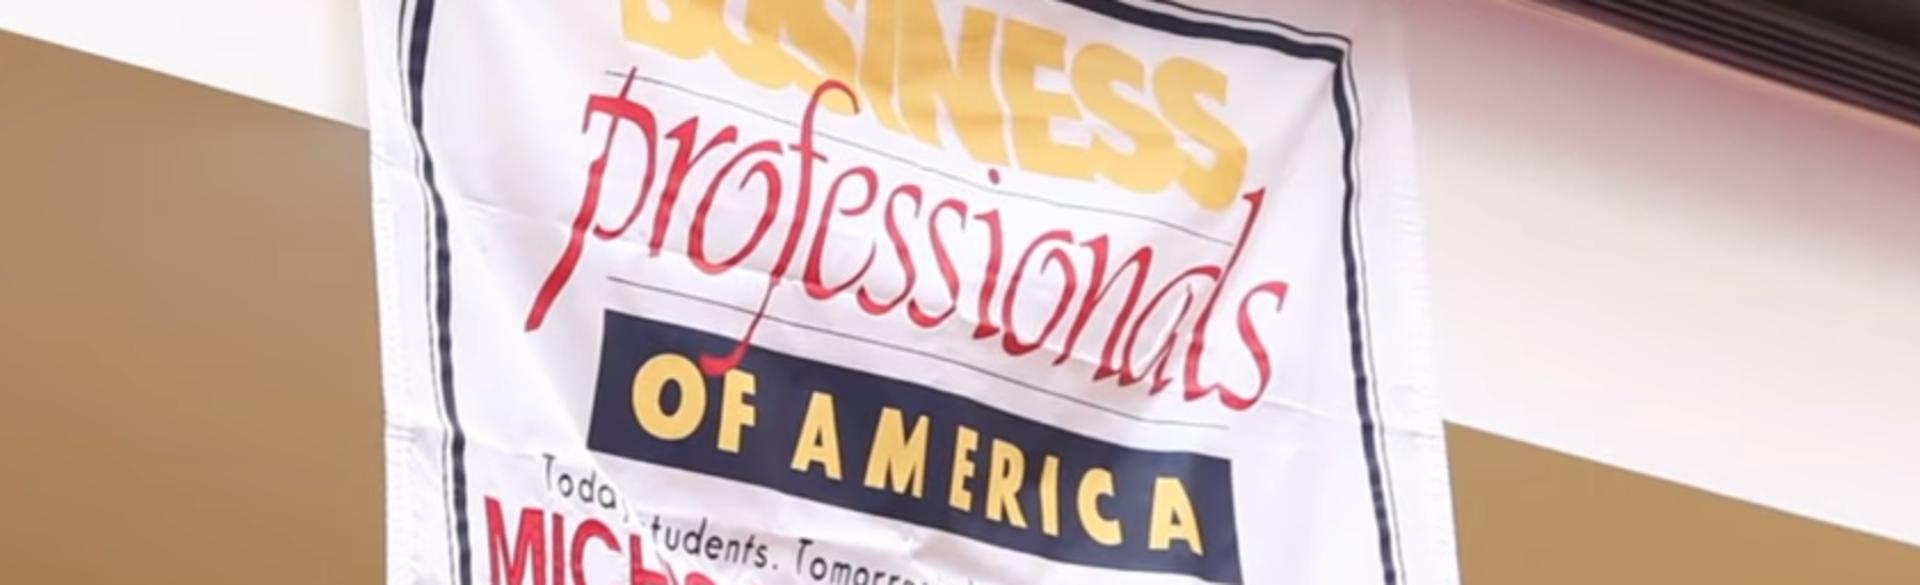 Michigan Association Business Professionals of America